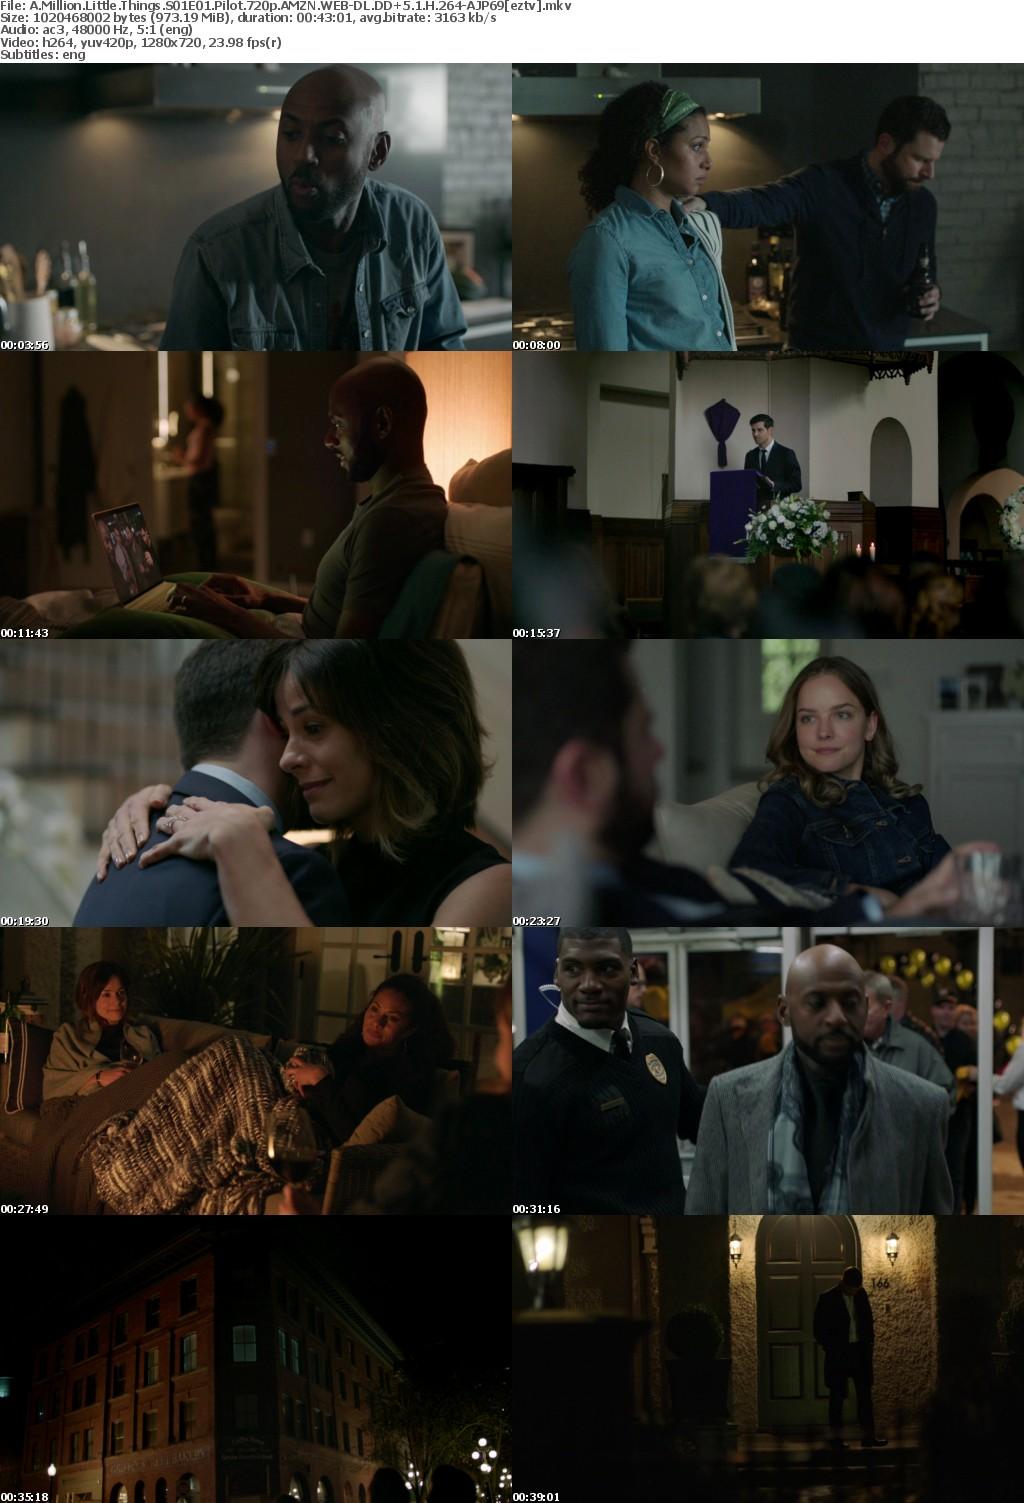 A Million Little Things S01E01 Pilot 720p AMZN WEB-DL DD+5 1 H 264-AJP69